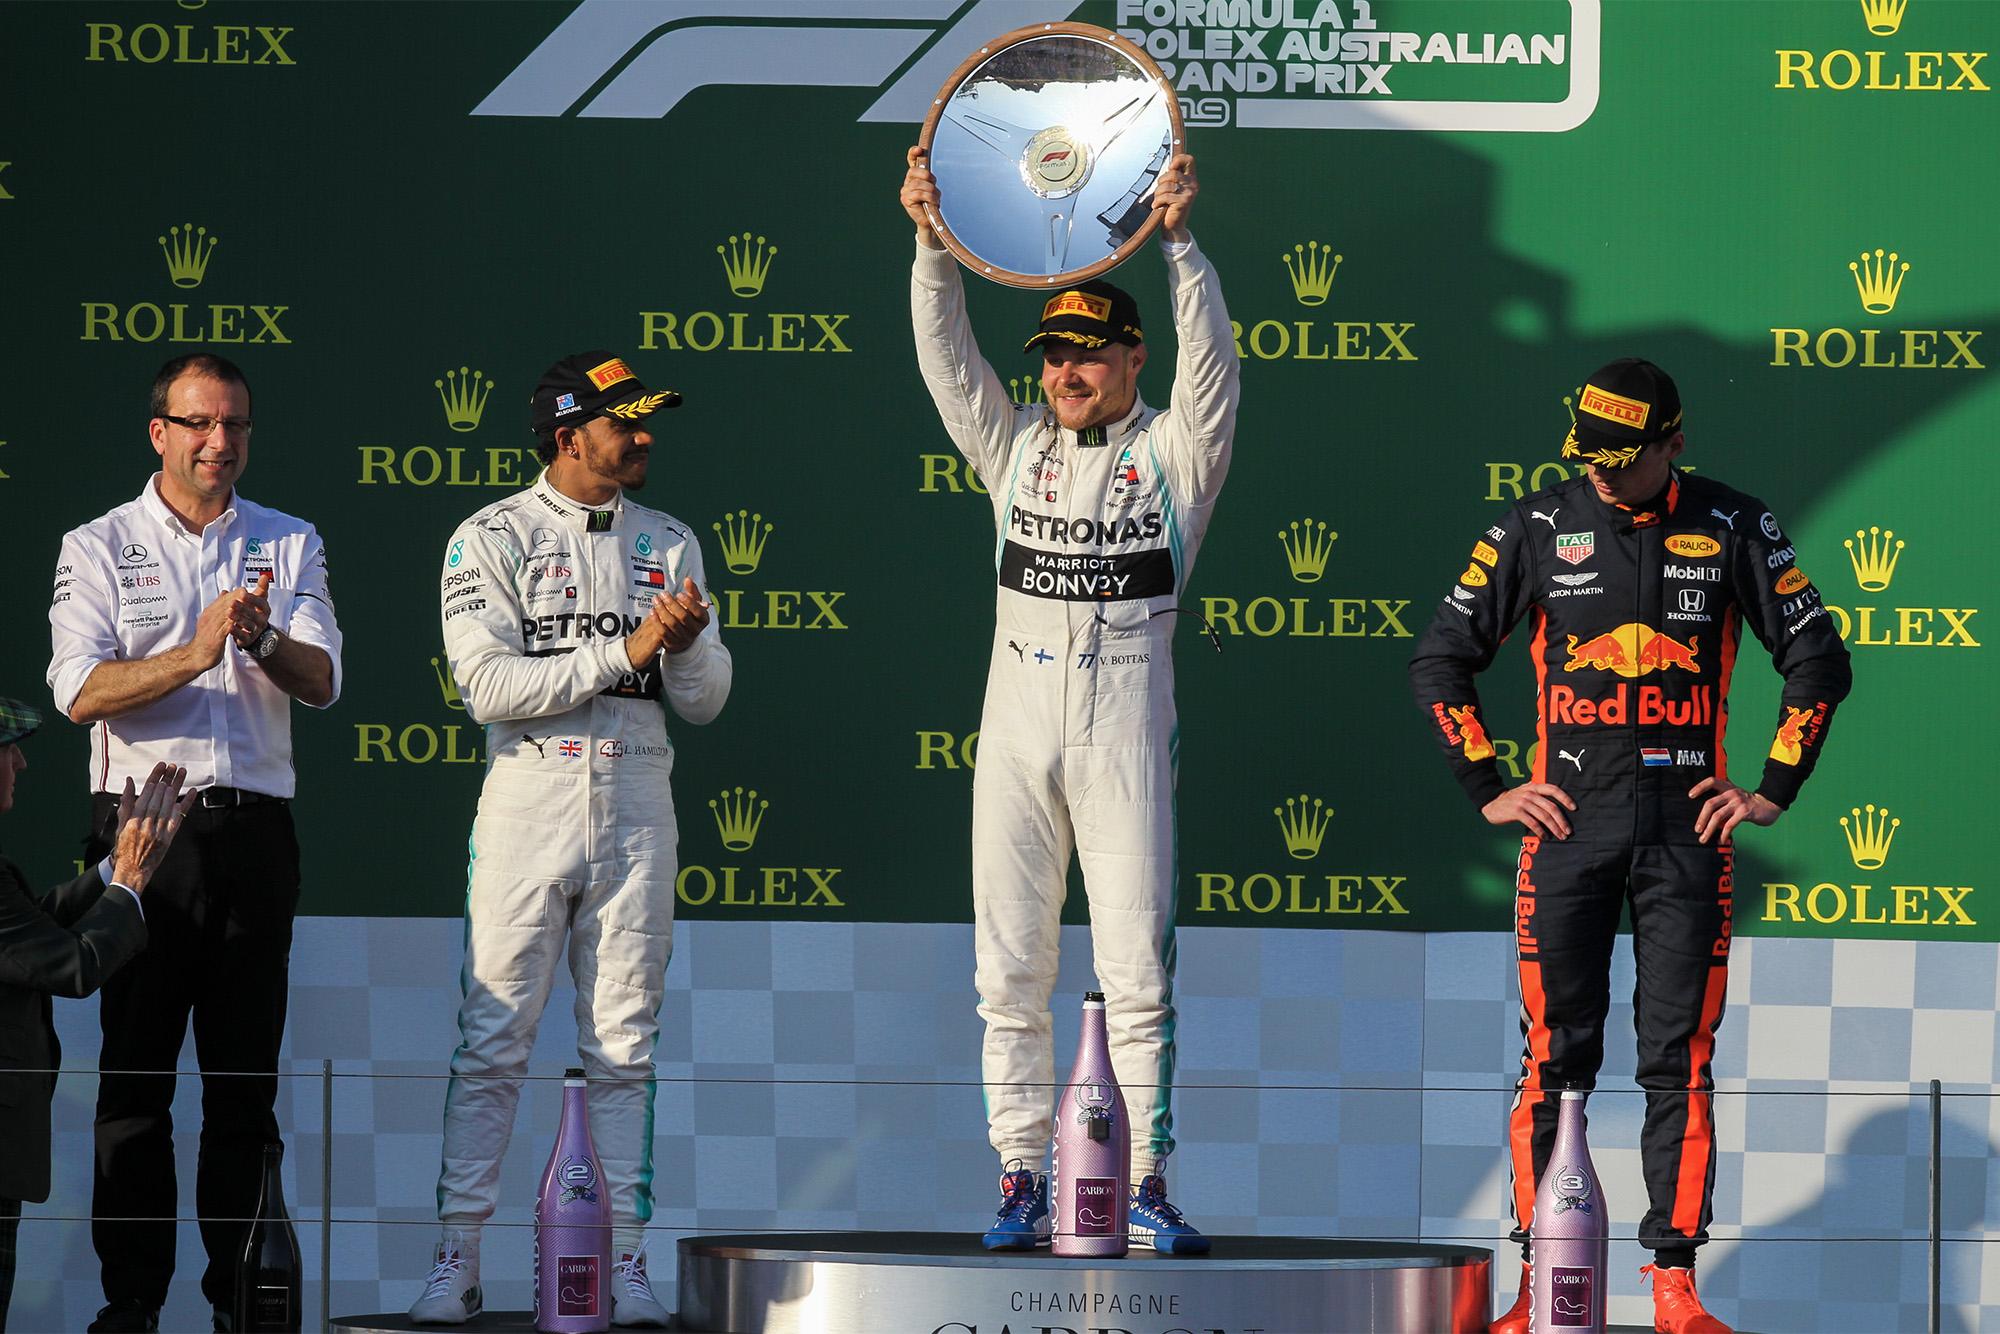 Valtteri Bottas celebrates his victory at the 2019 Australian Grand Prix